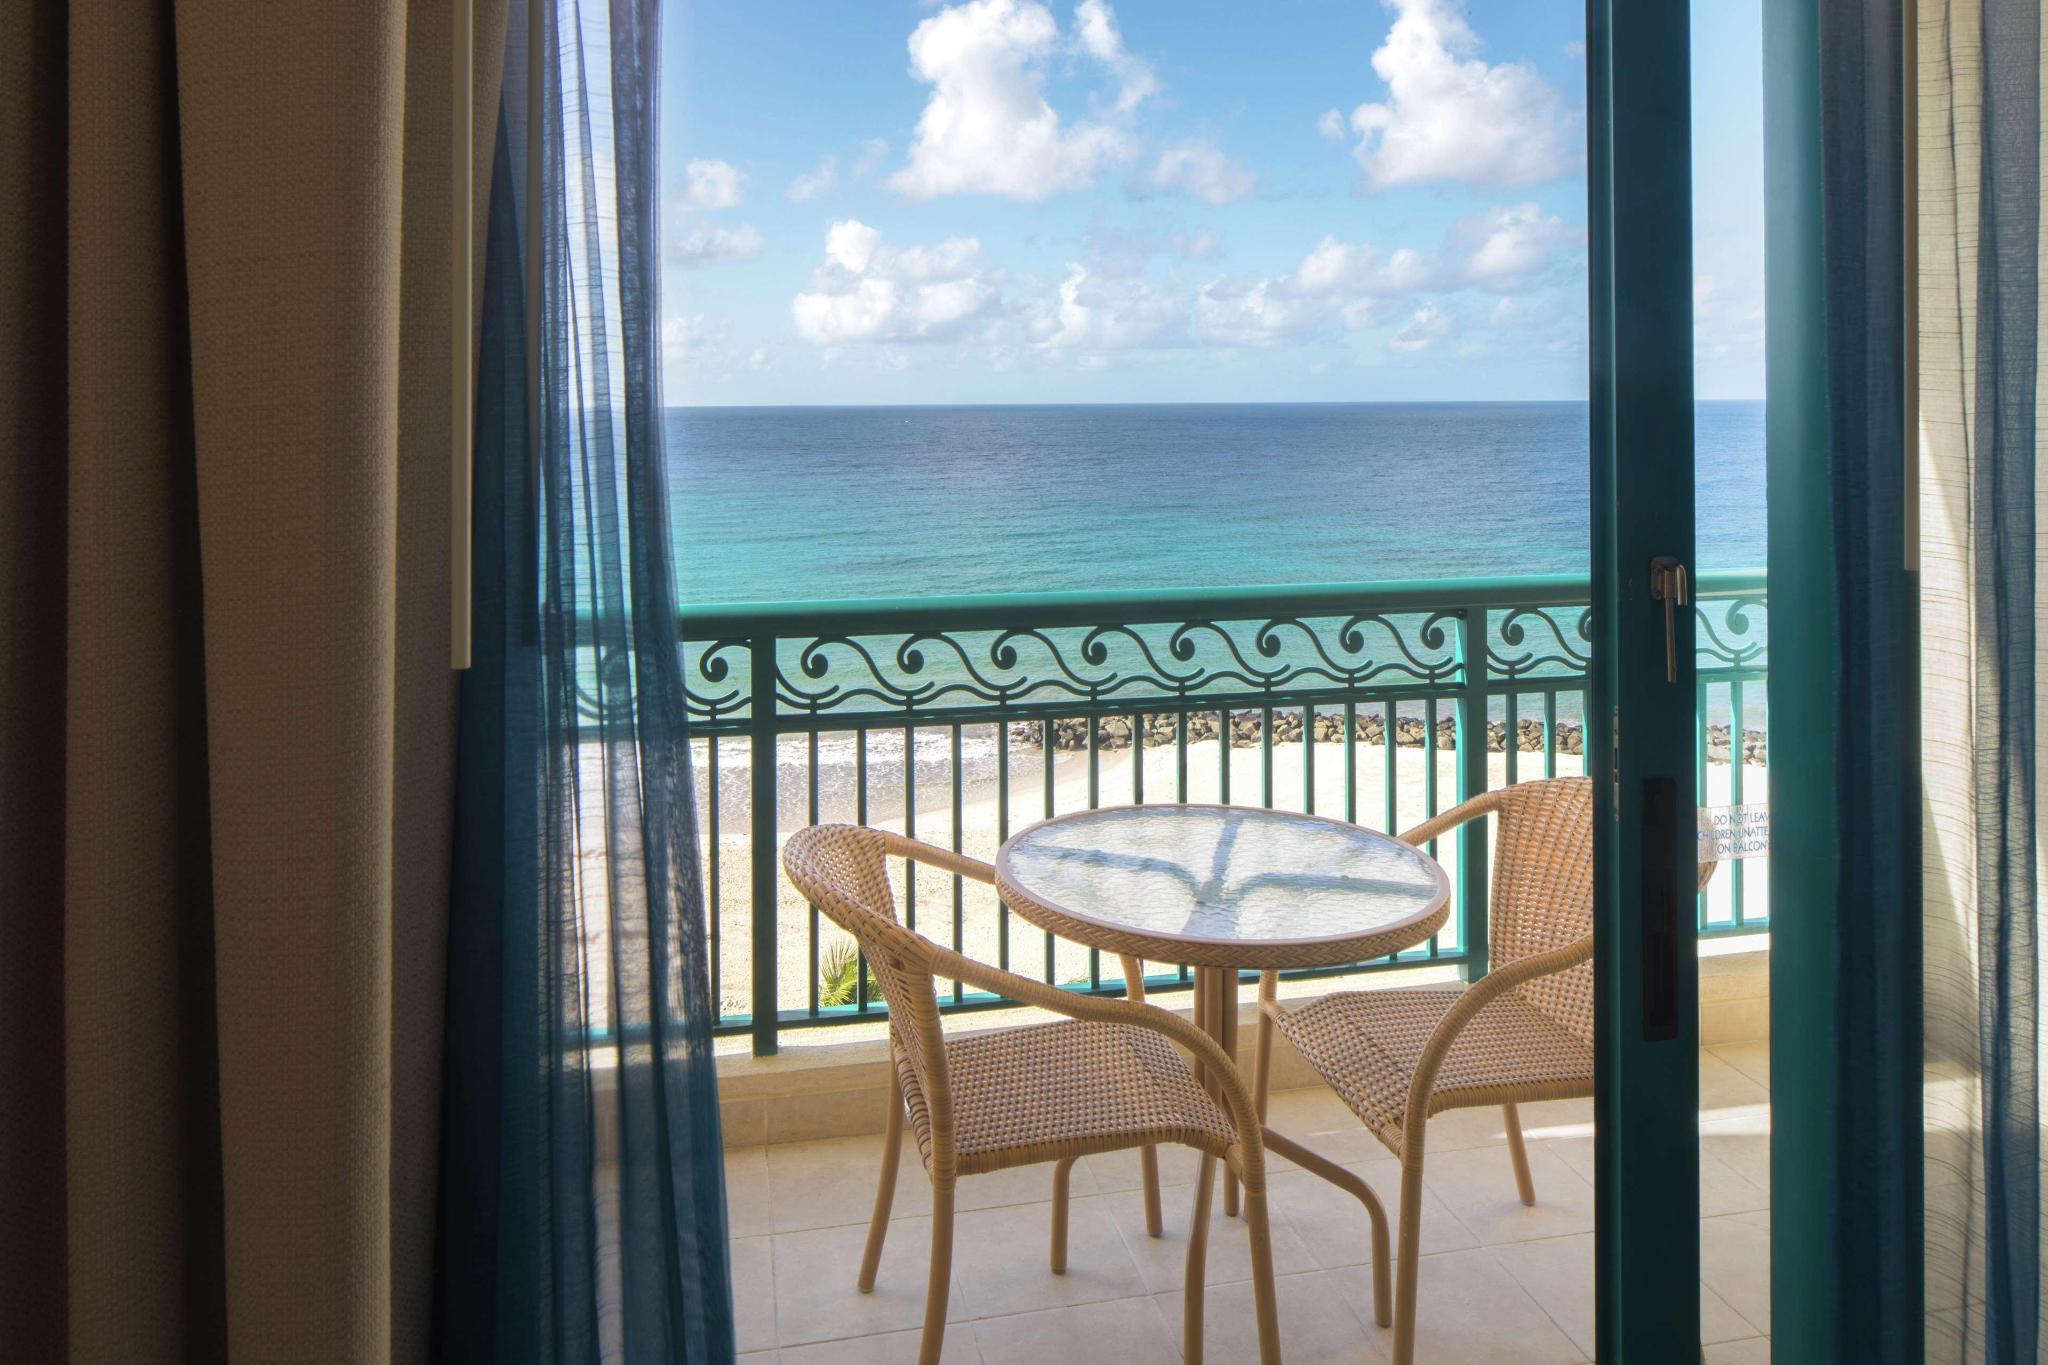 Premium Ocean View 1 King Bed